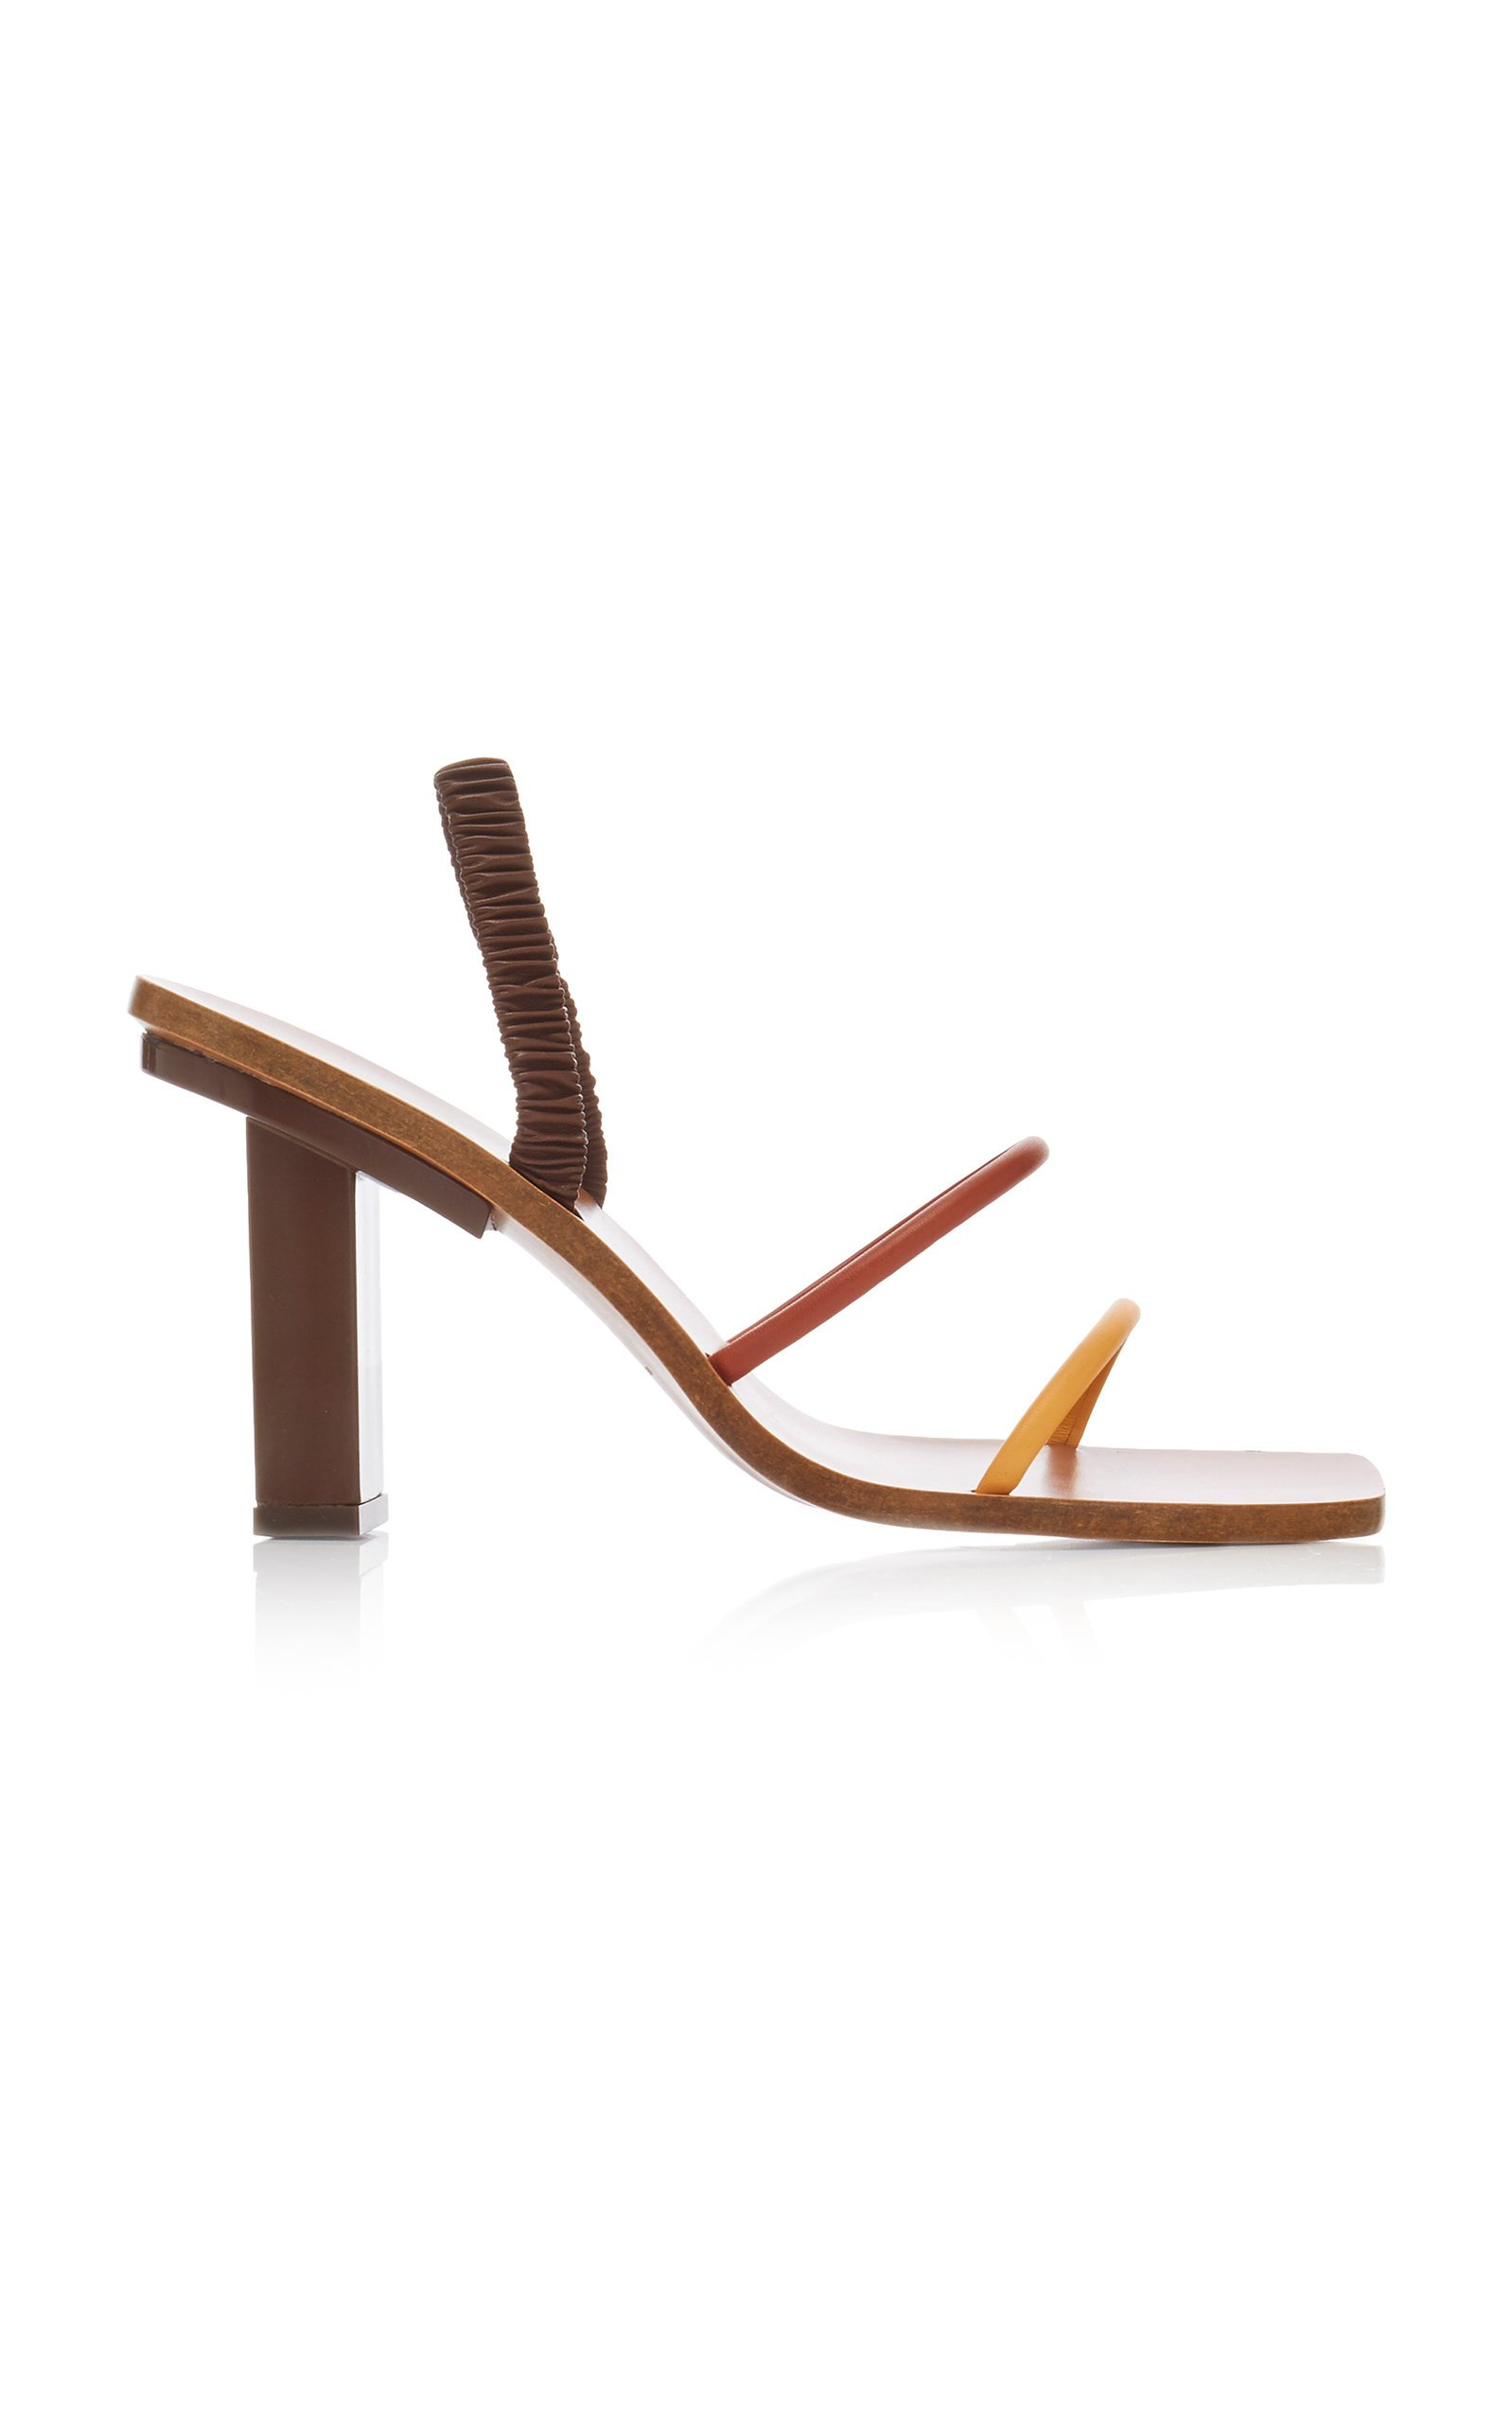 Kaia Leather Sandals by Cult Gaia | Moda Operandi